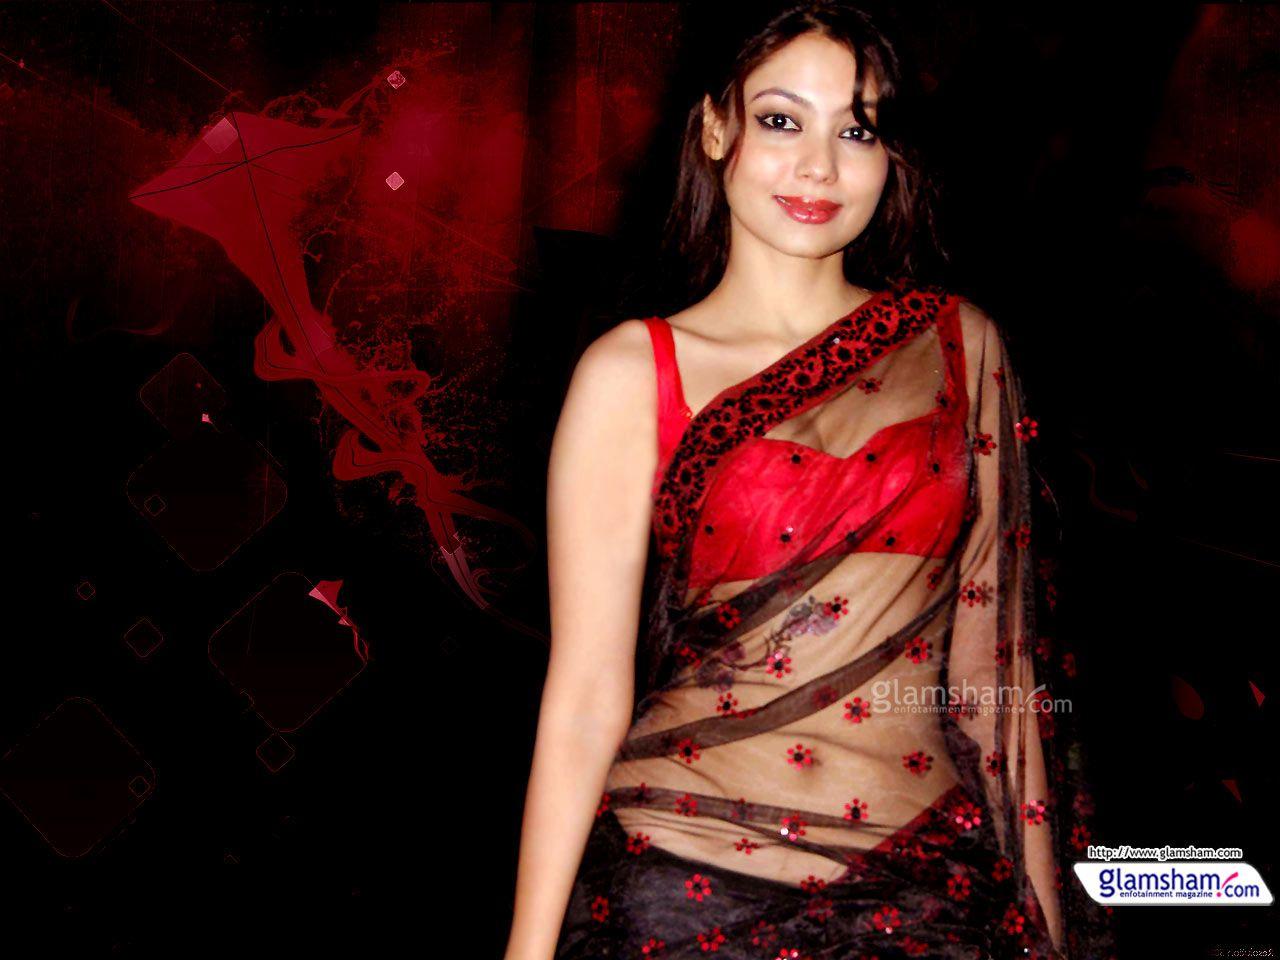 hot indian model female wallpaper | jerzon52 | pinterest | free